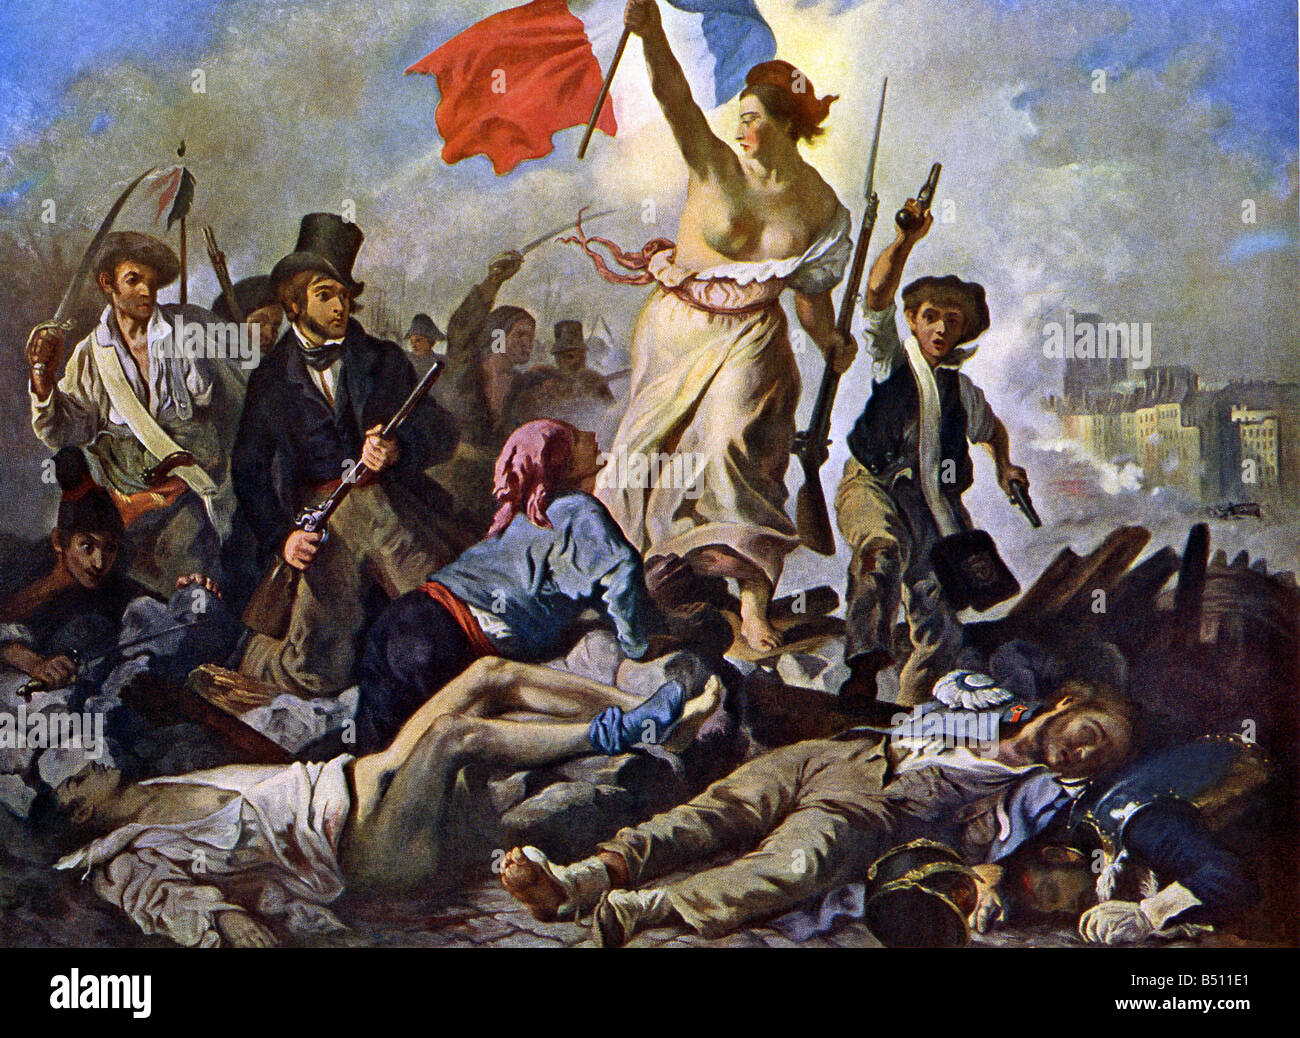 Juli 1830 französische Revolution Stockbild